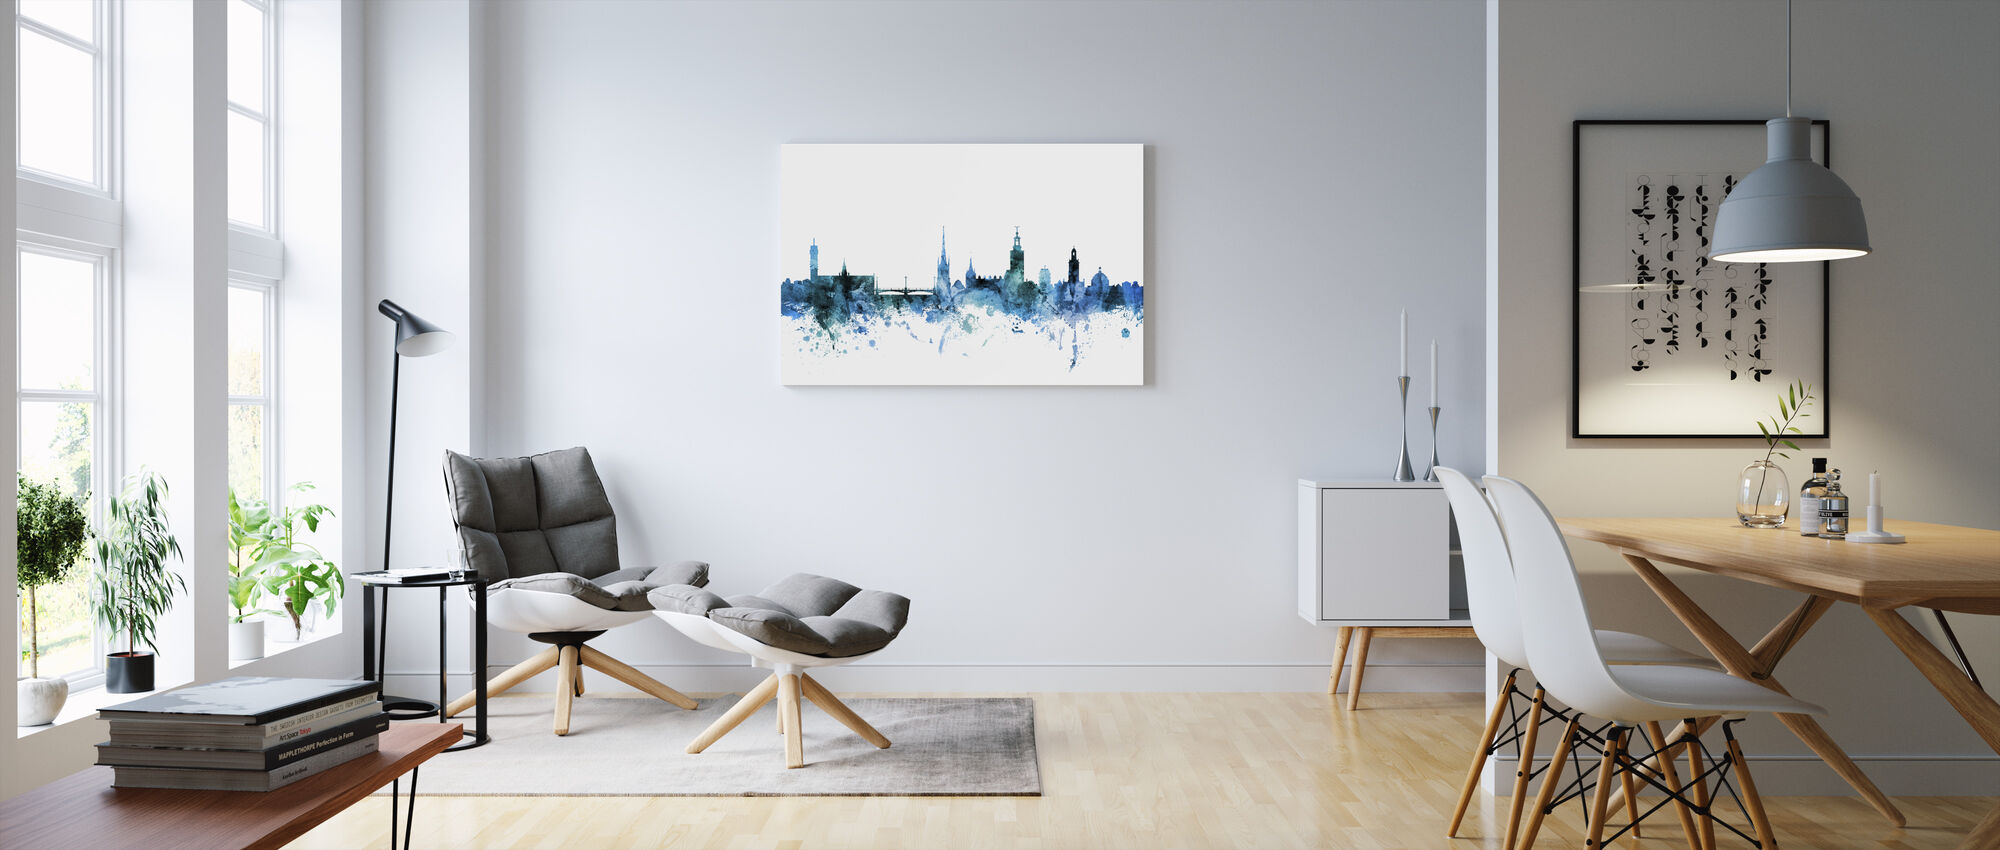 Stockholm Sverige Skyline - Canvastavla - Vardagsrum